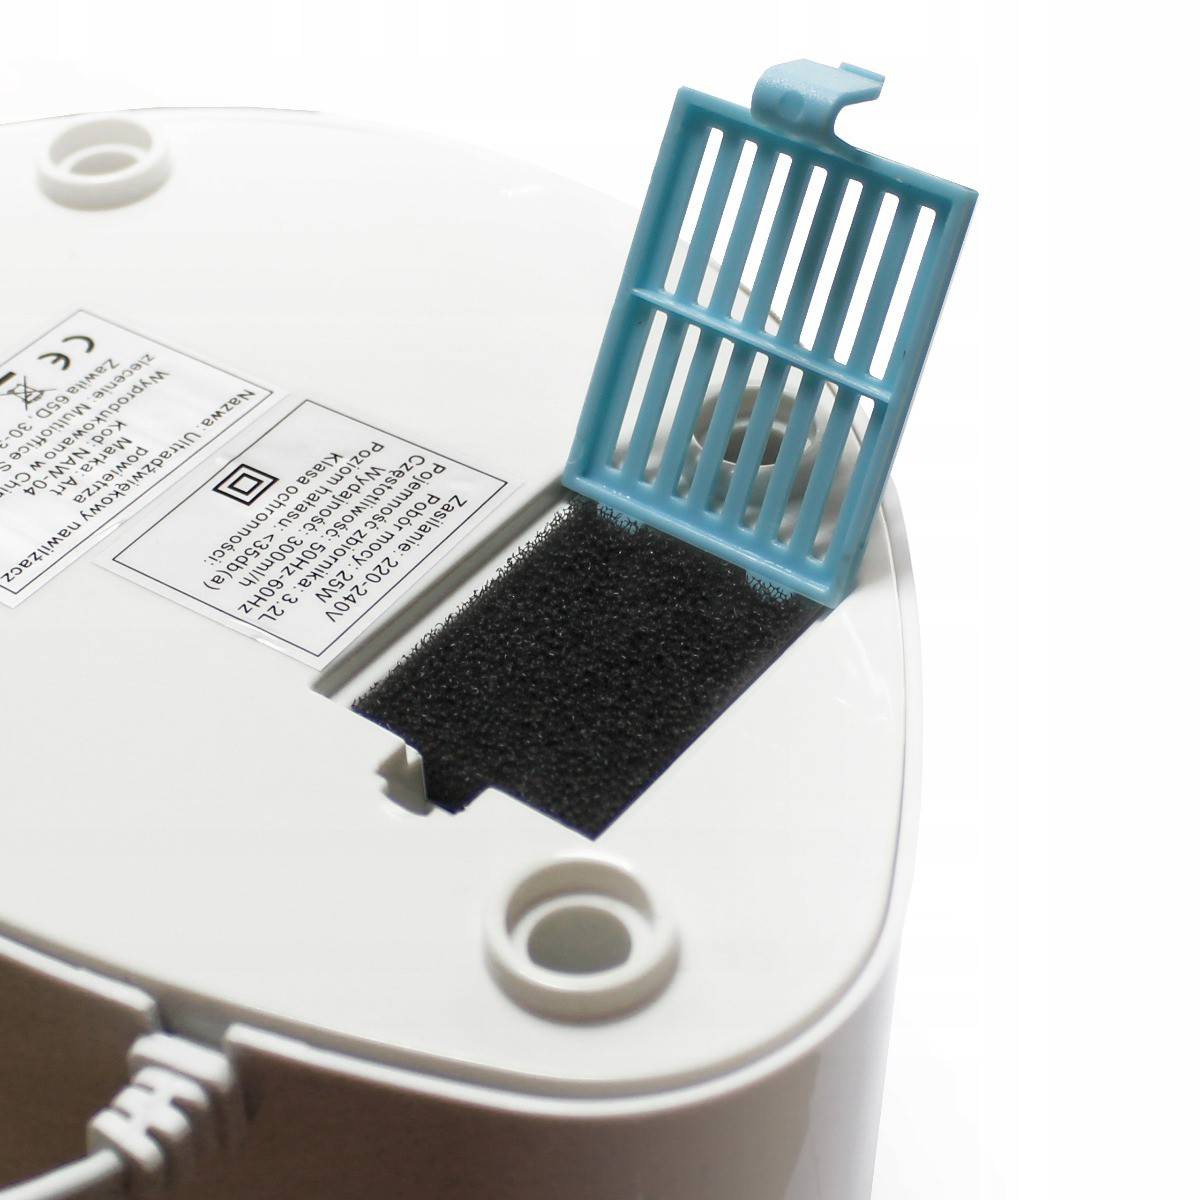 Zvlhčovač vzduchu Ionizácia Aromaterapia 3,2L 35W 300 ml/h megamix.sk